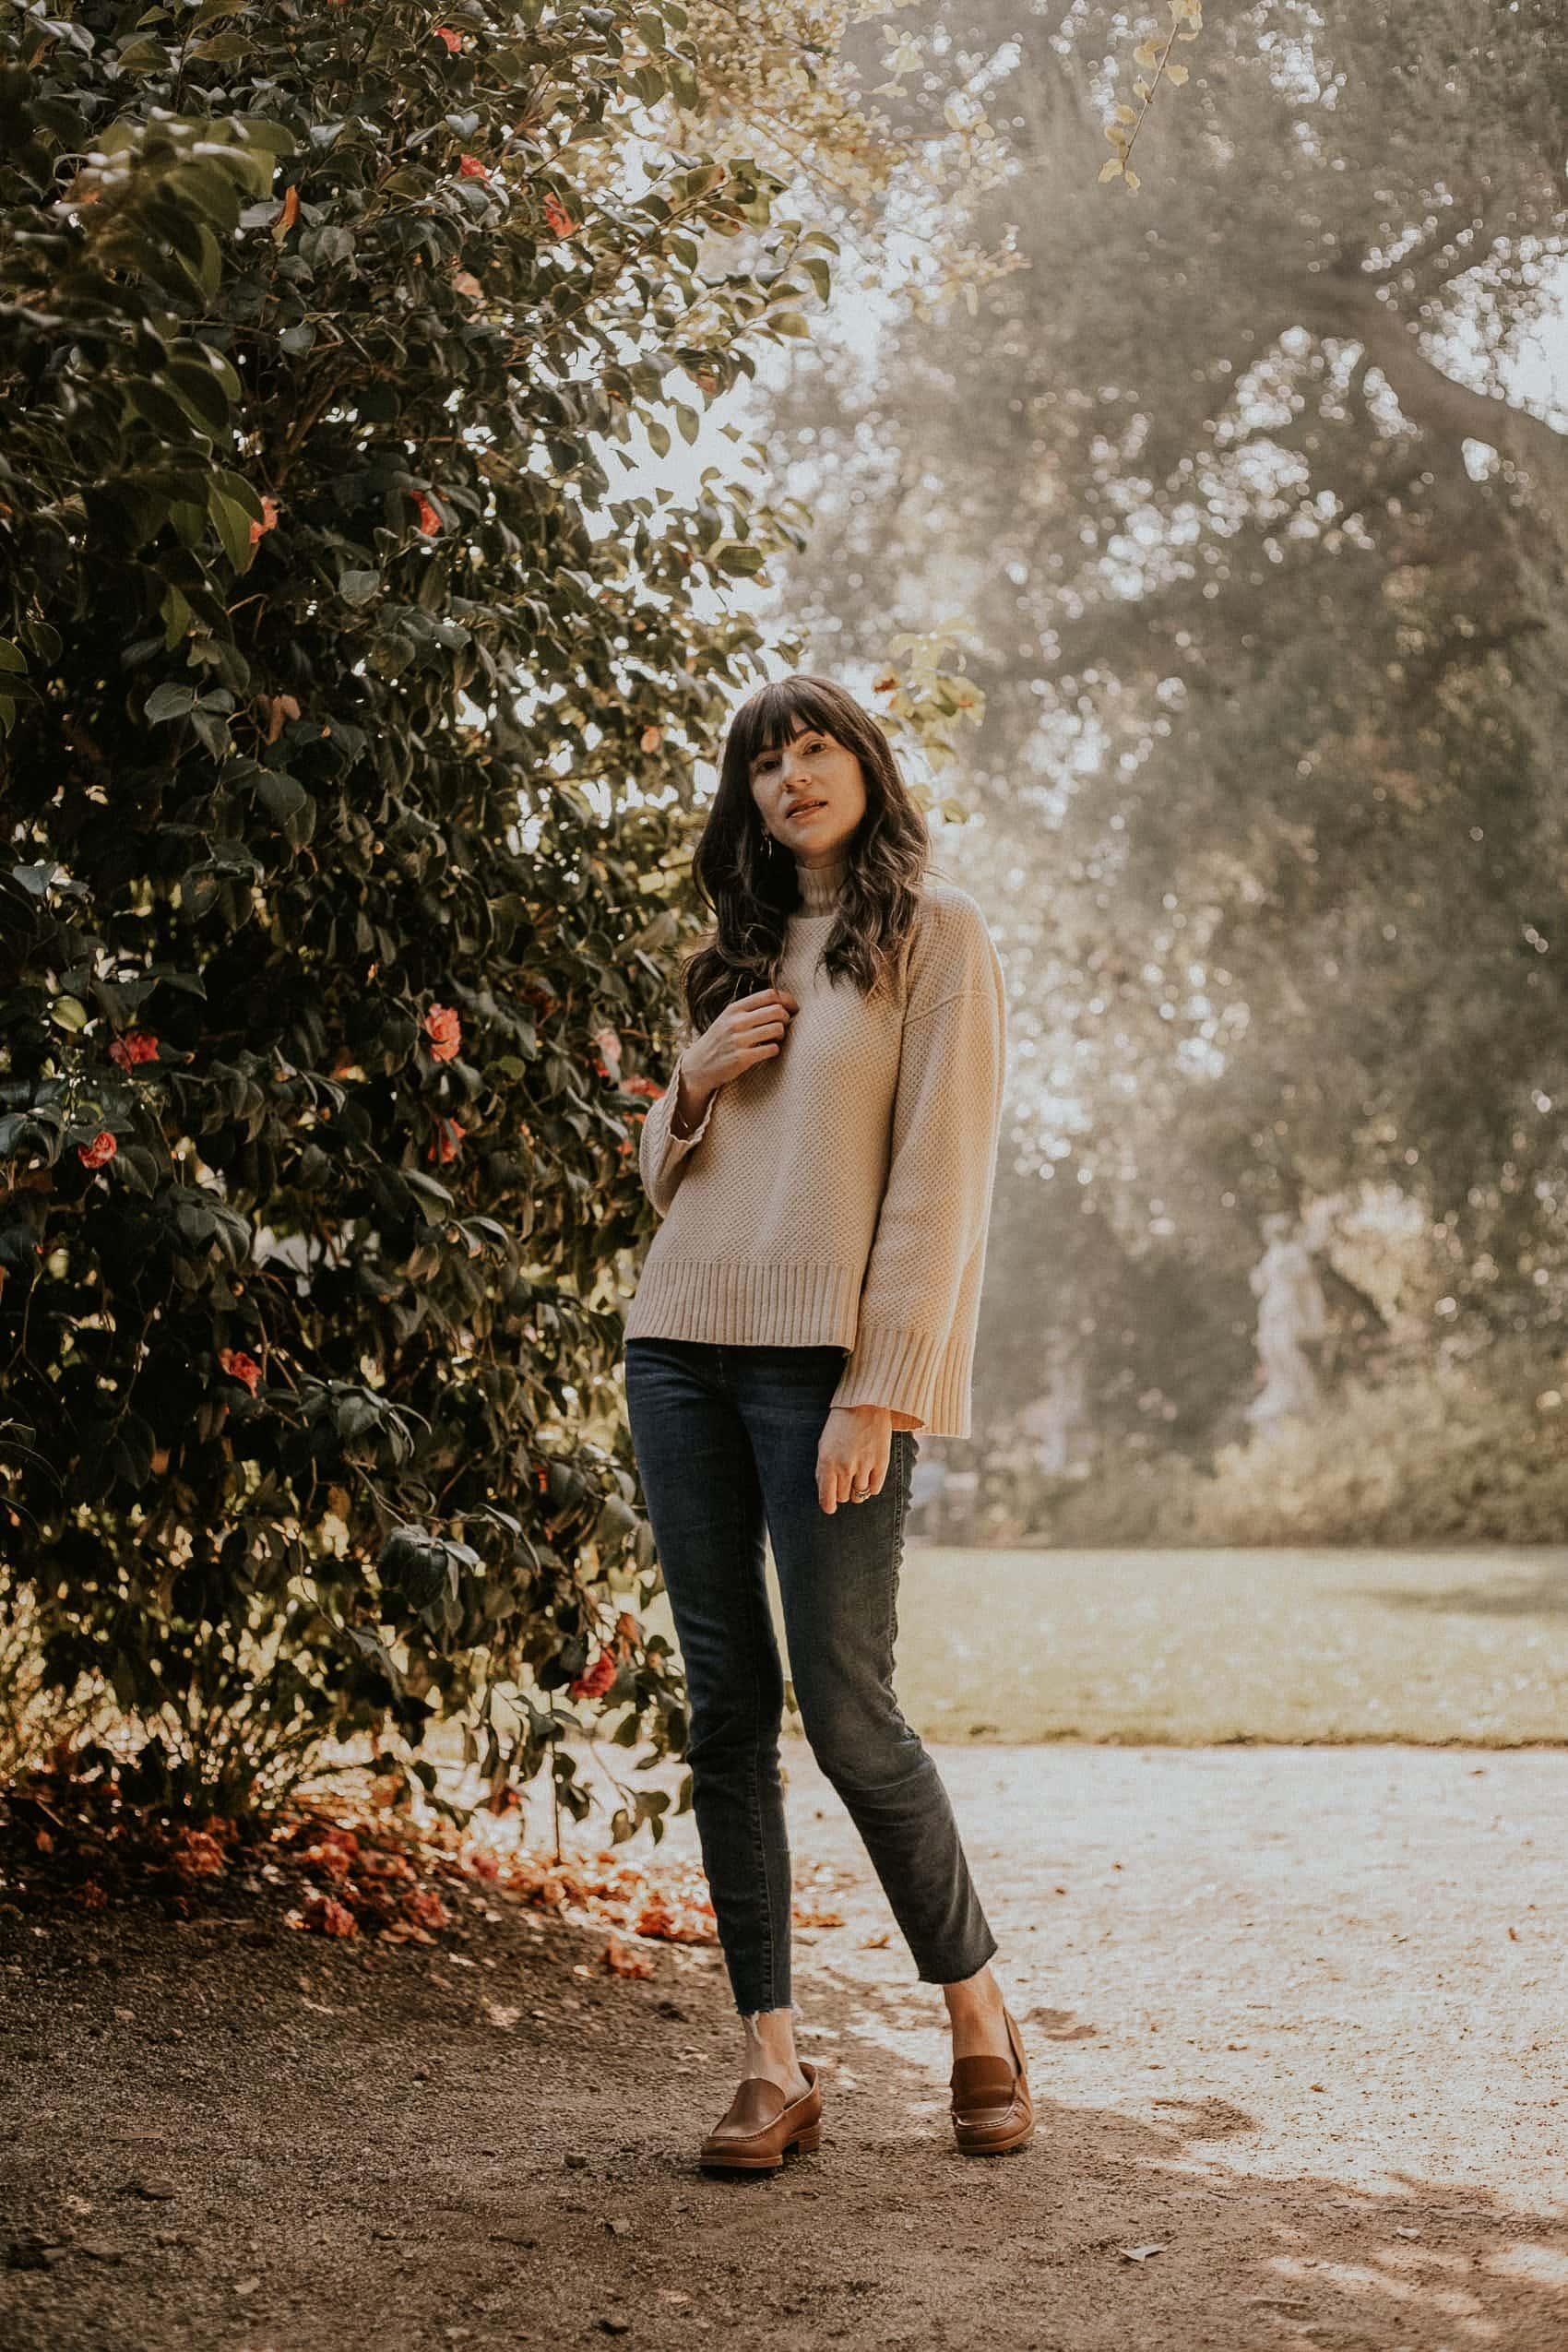 Everlane Cashmere Sweater, Everlane Denim, Everlane New Modern Loafer outfit on fashion blogger at Huntington Gardens